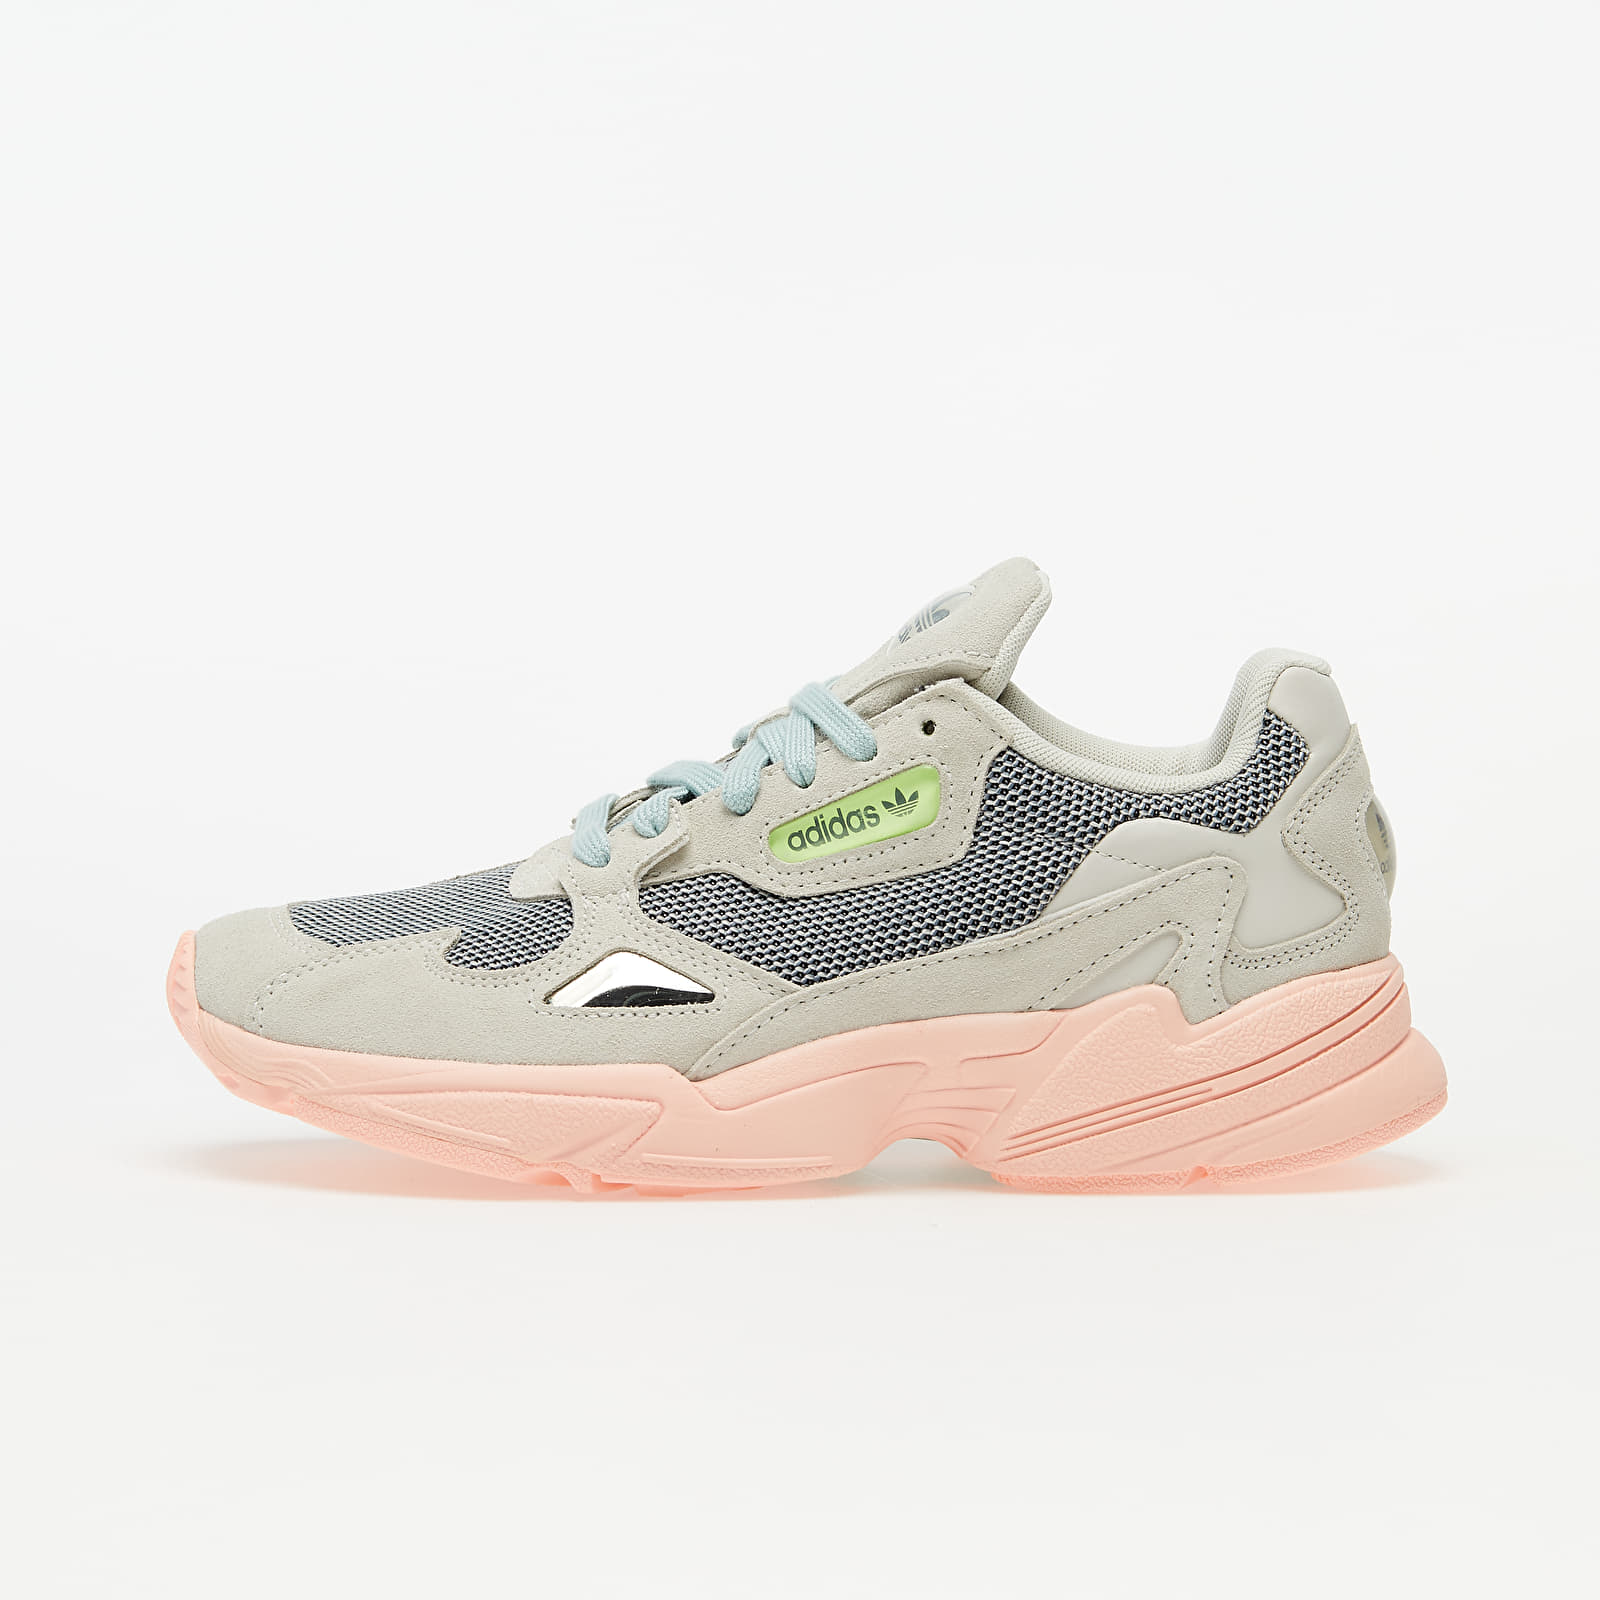 Perseo Insistir Plata  Women's shoes adidas Falcon W Talc/ Haze Coral/ Green Tint | Footshop